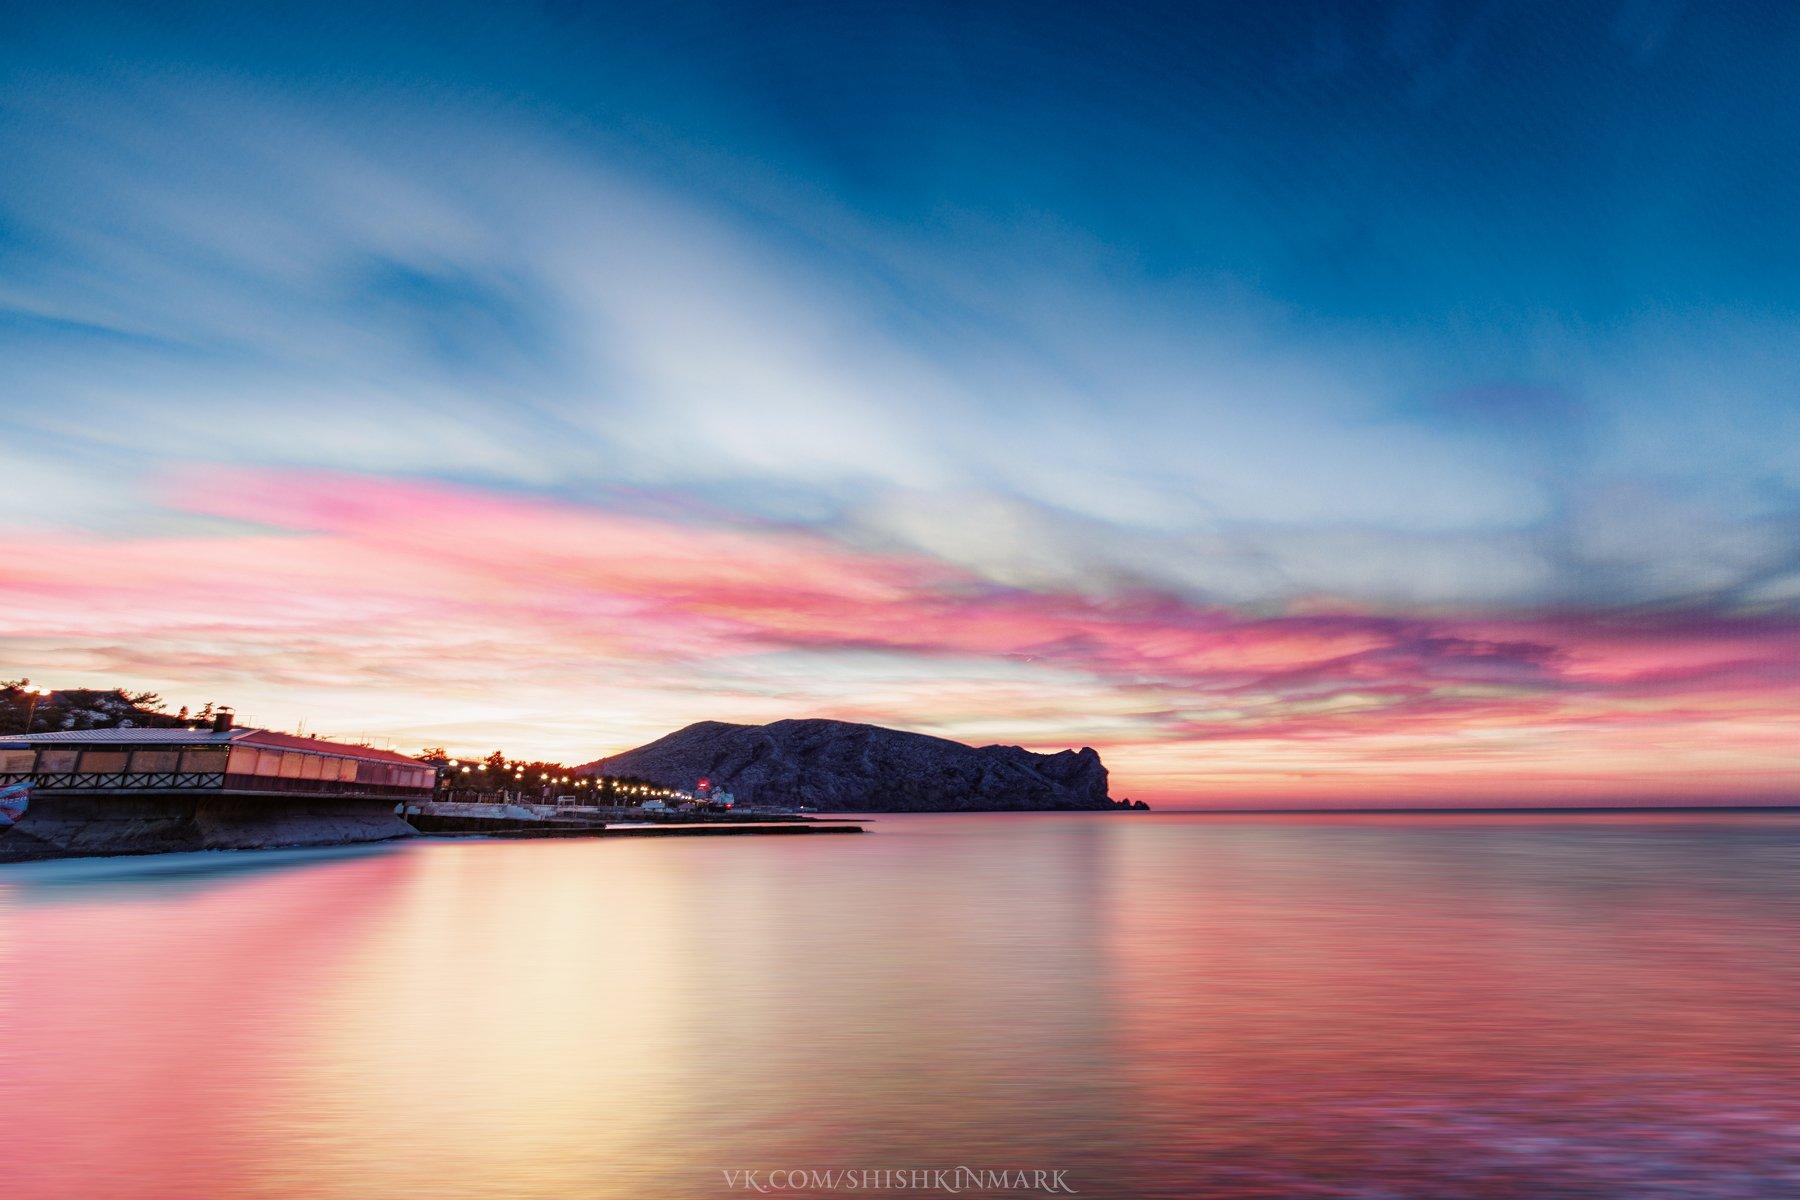 красота, природа, пейзаж, рассвет, закат, облака, небо, Крым, Шишкин Марк